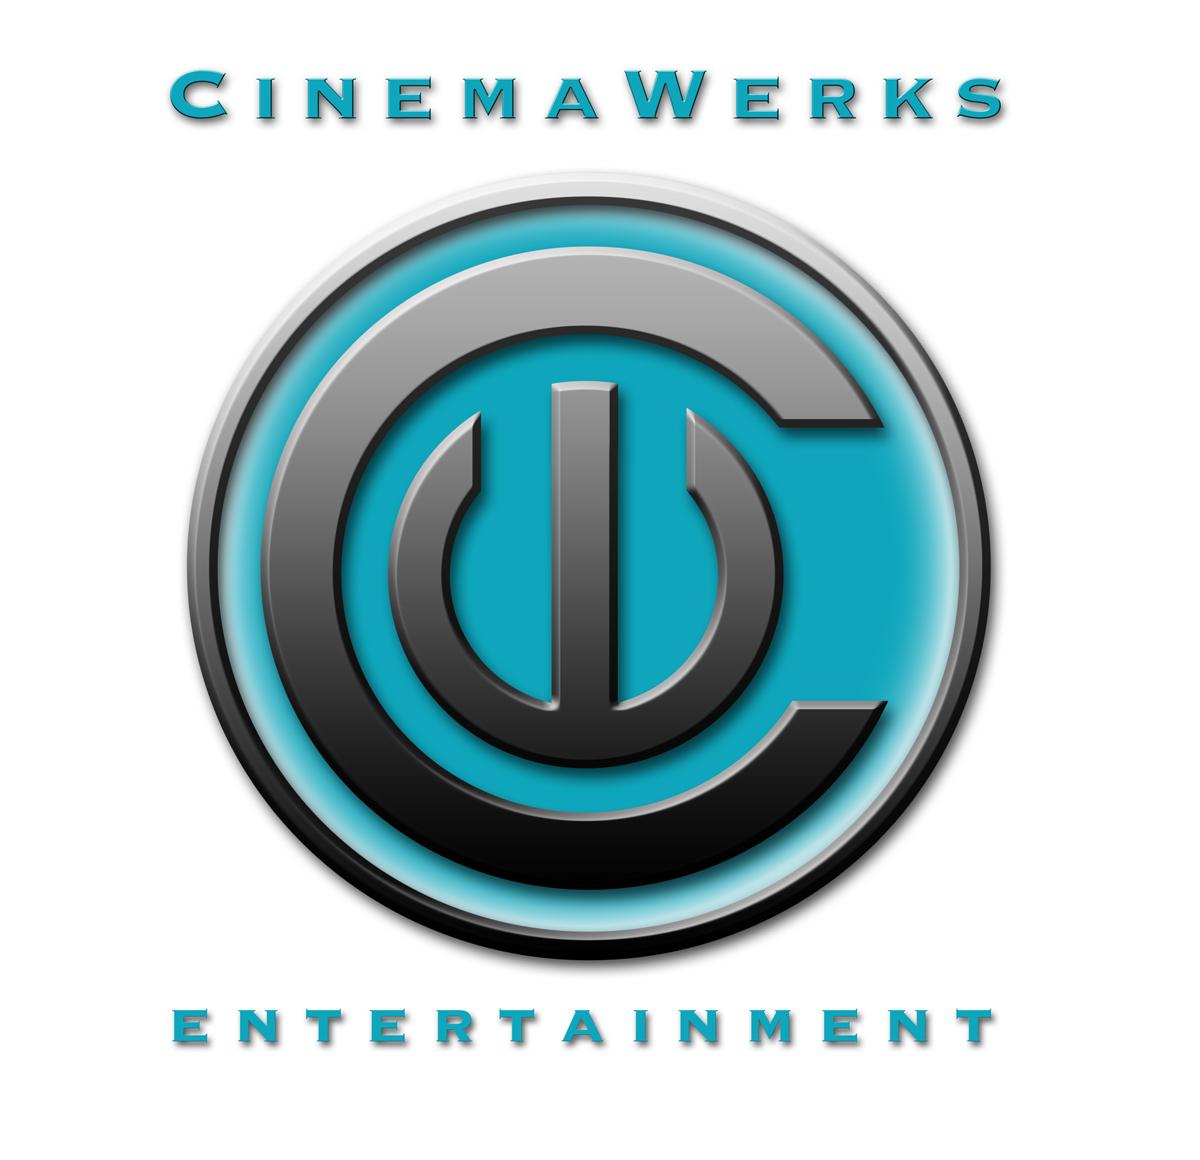 cinemawerks-logo-.jpg